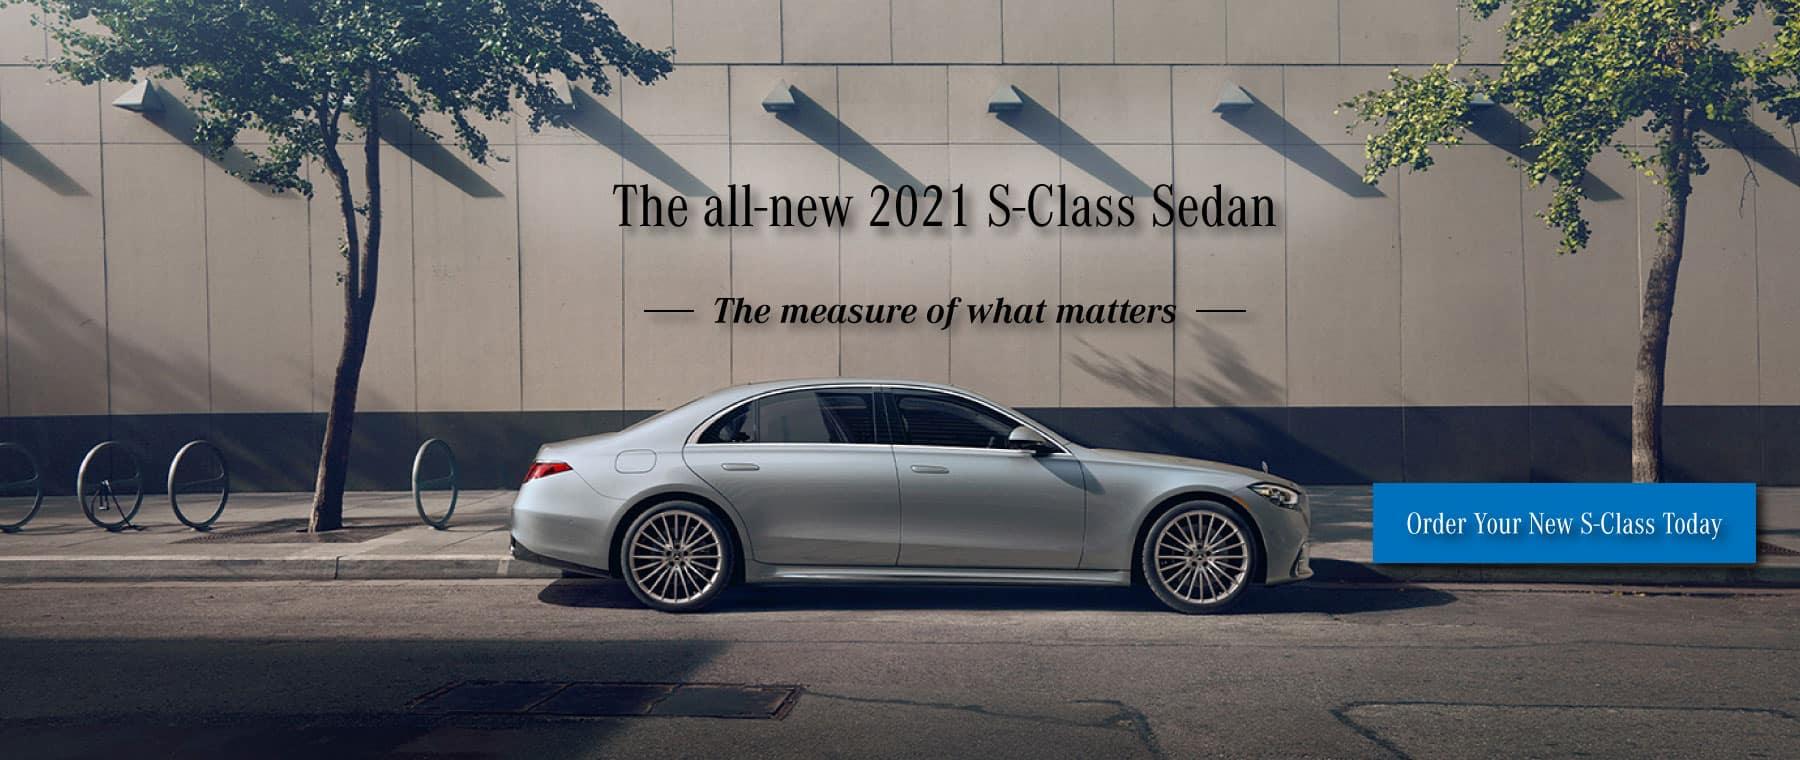 Mercedes-Benz of Fort Washington 2021 S-class Sedan